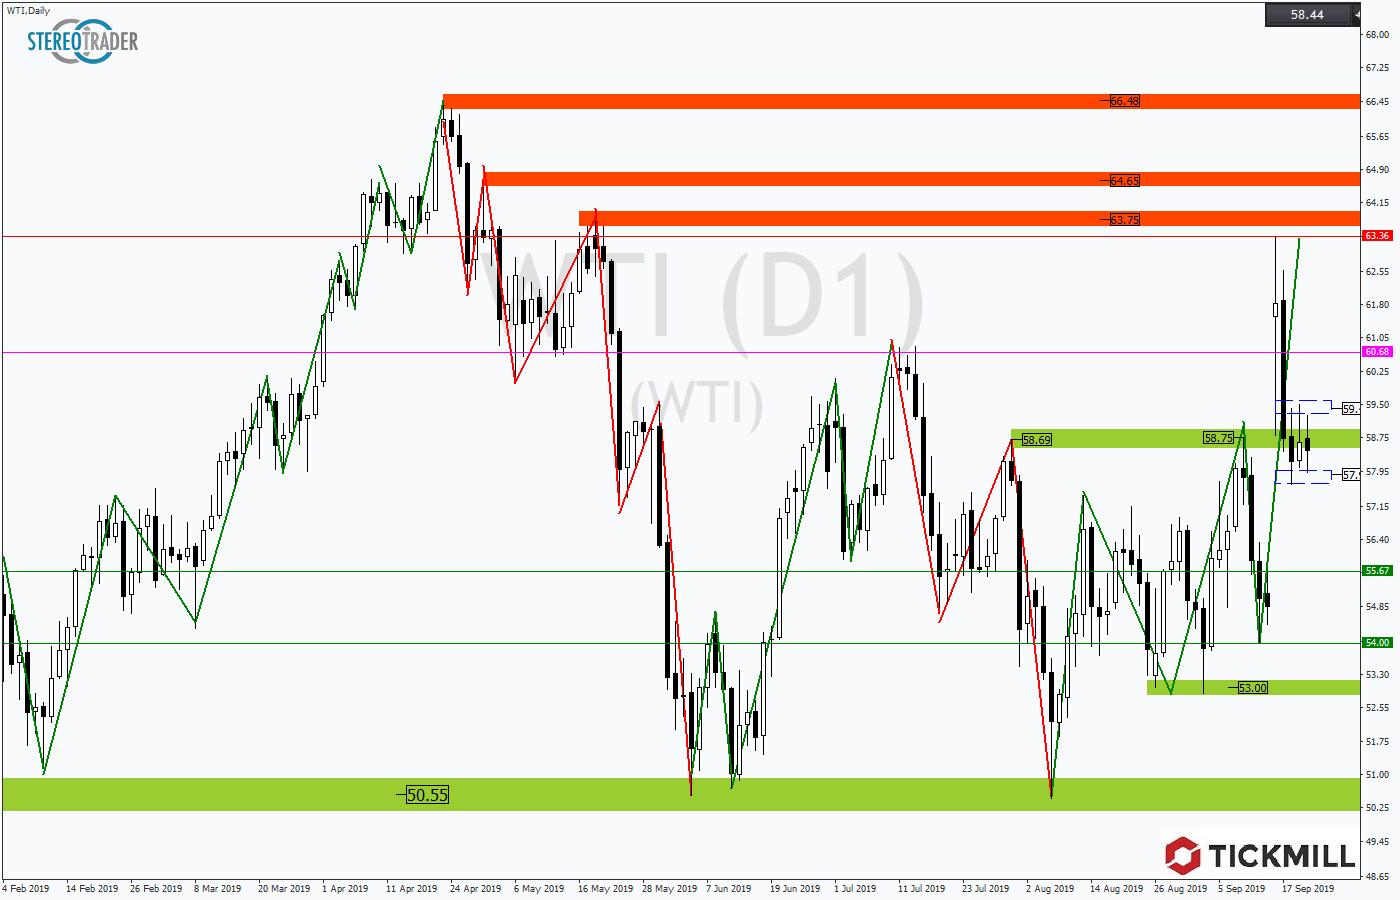 Tickmill-Analyse: Range im WTI